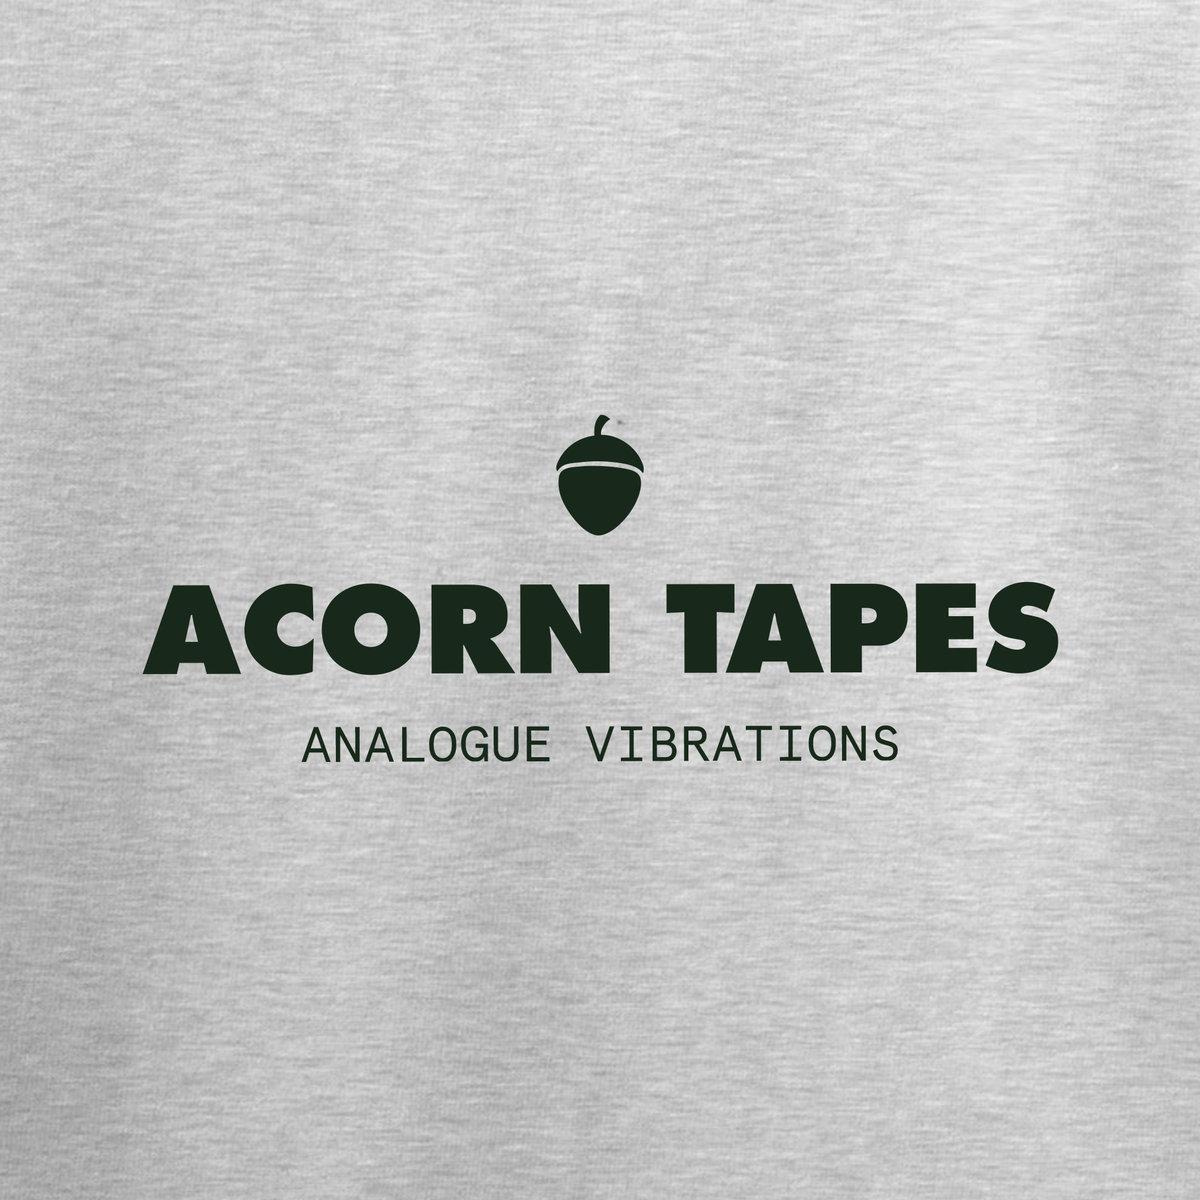 Acorn Tapes